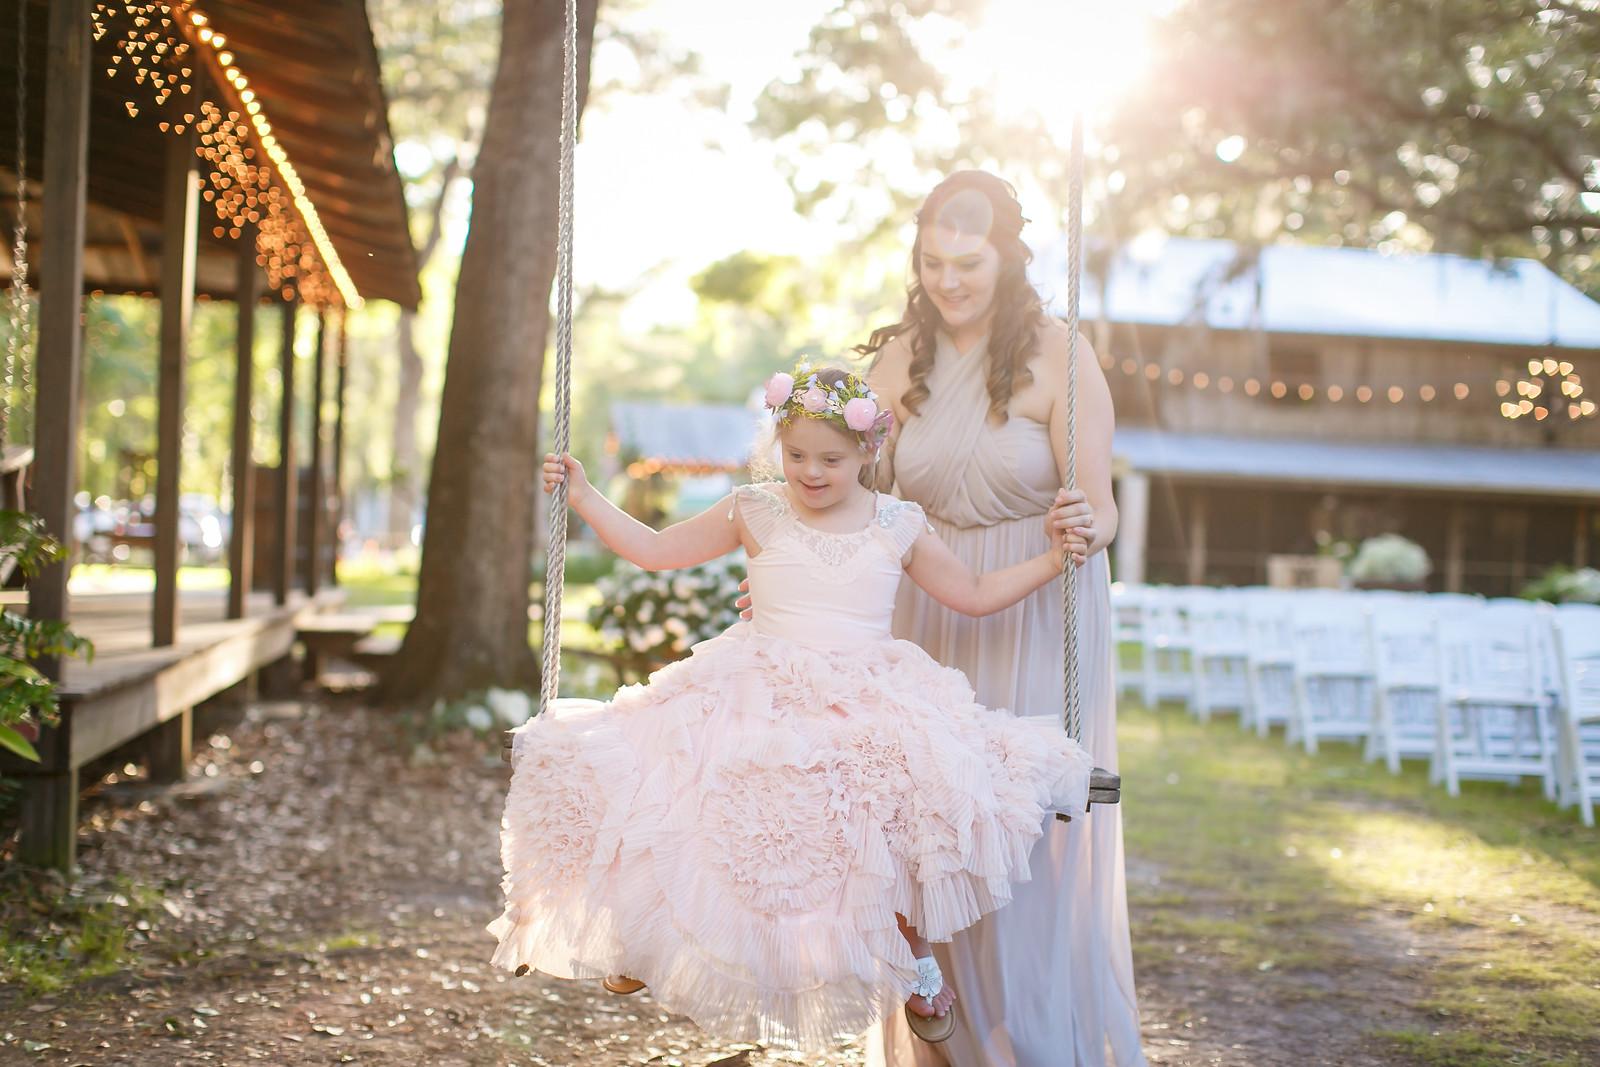 CAP2017-MadisonKyle-WEDDING-Giselle-TuckersFarmhouse-1027